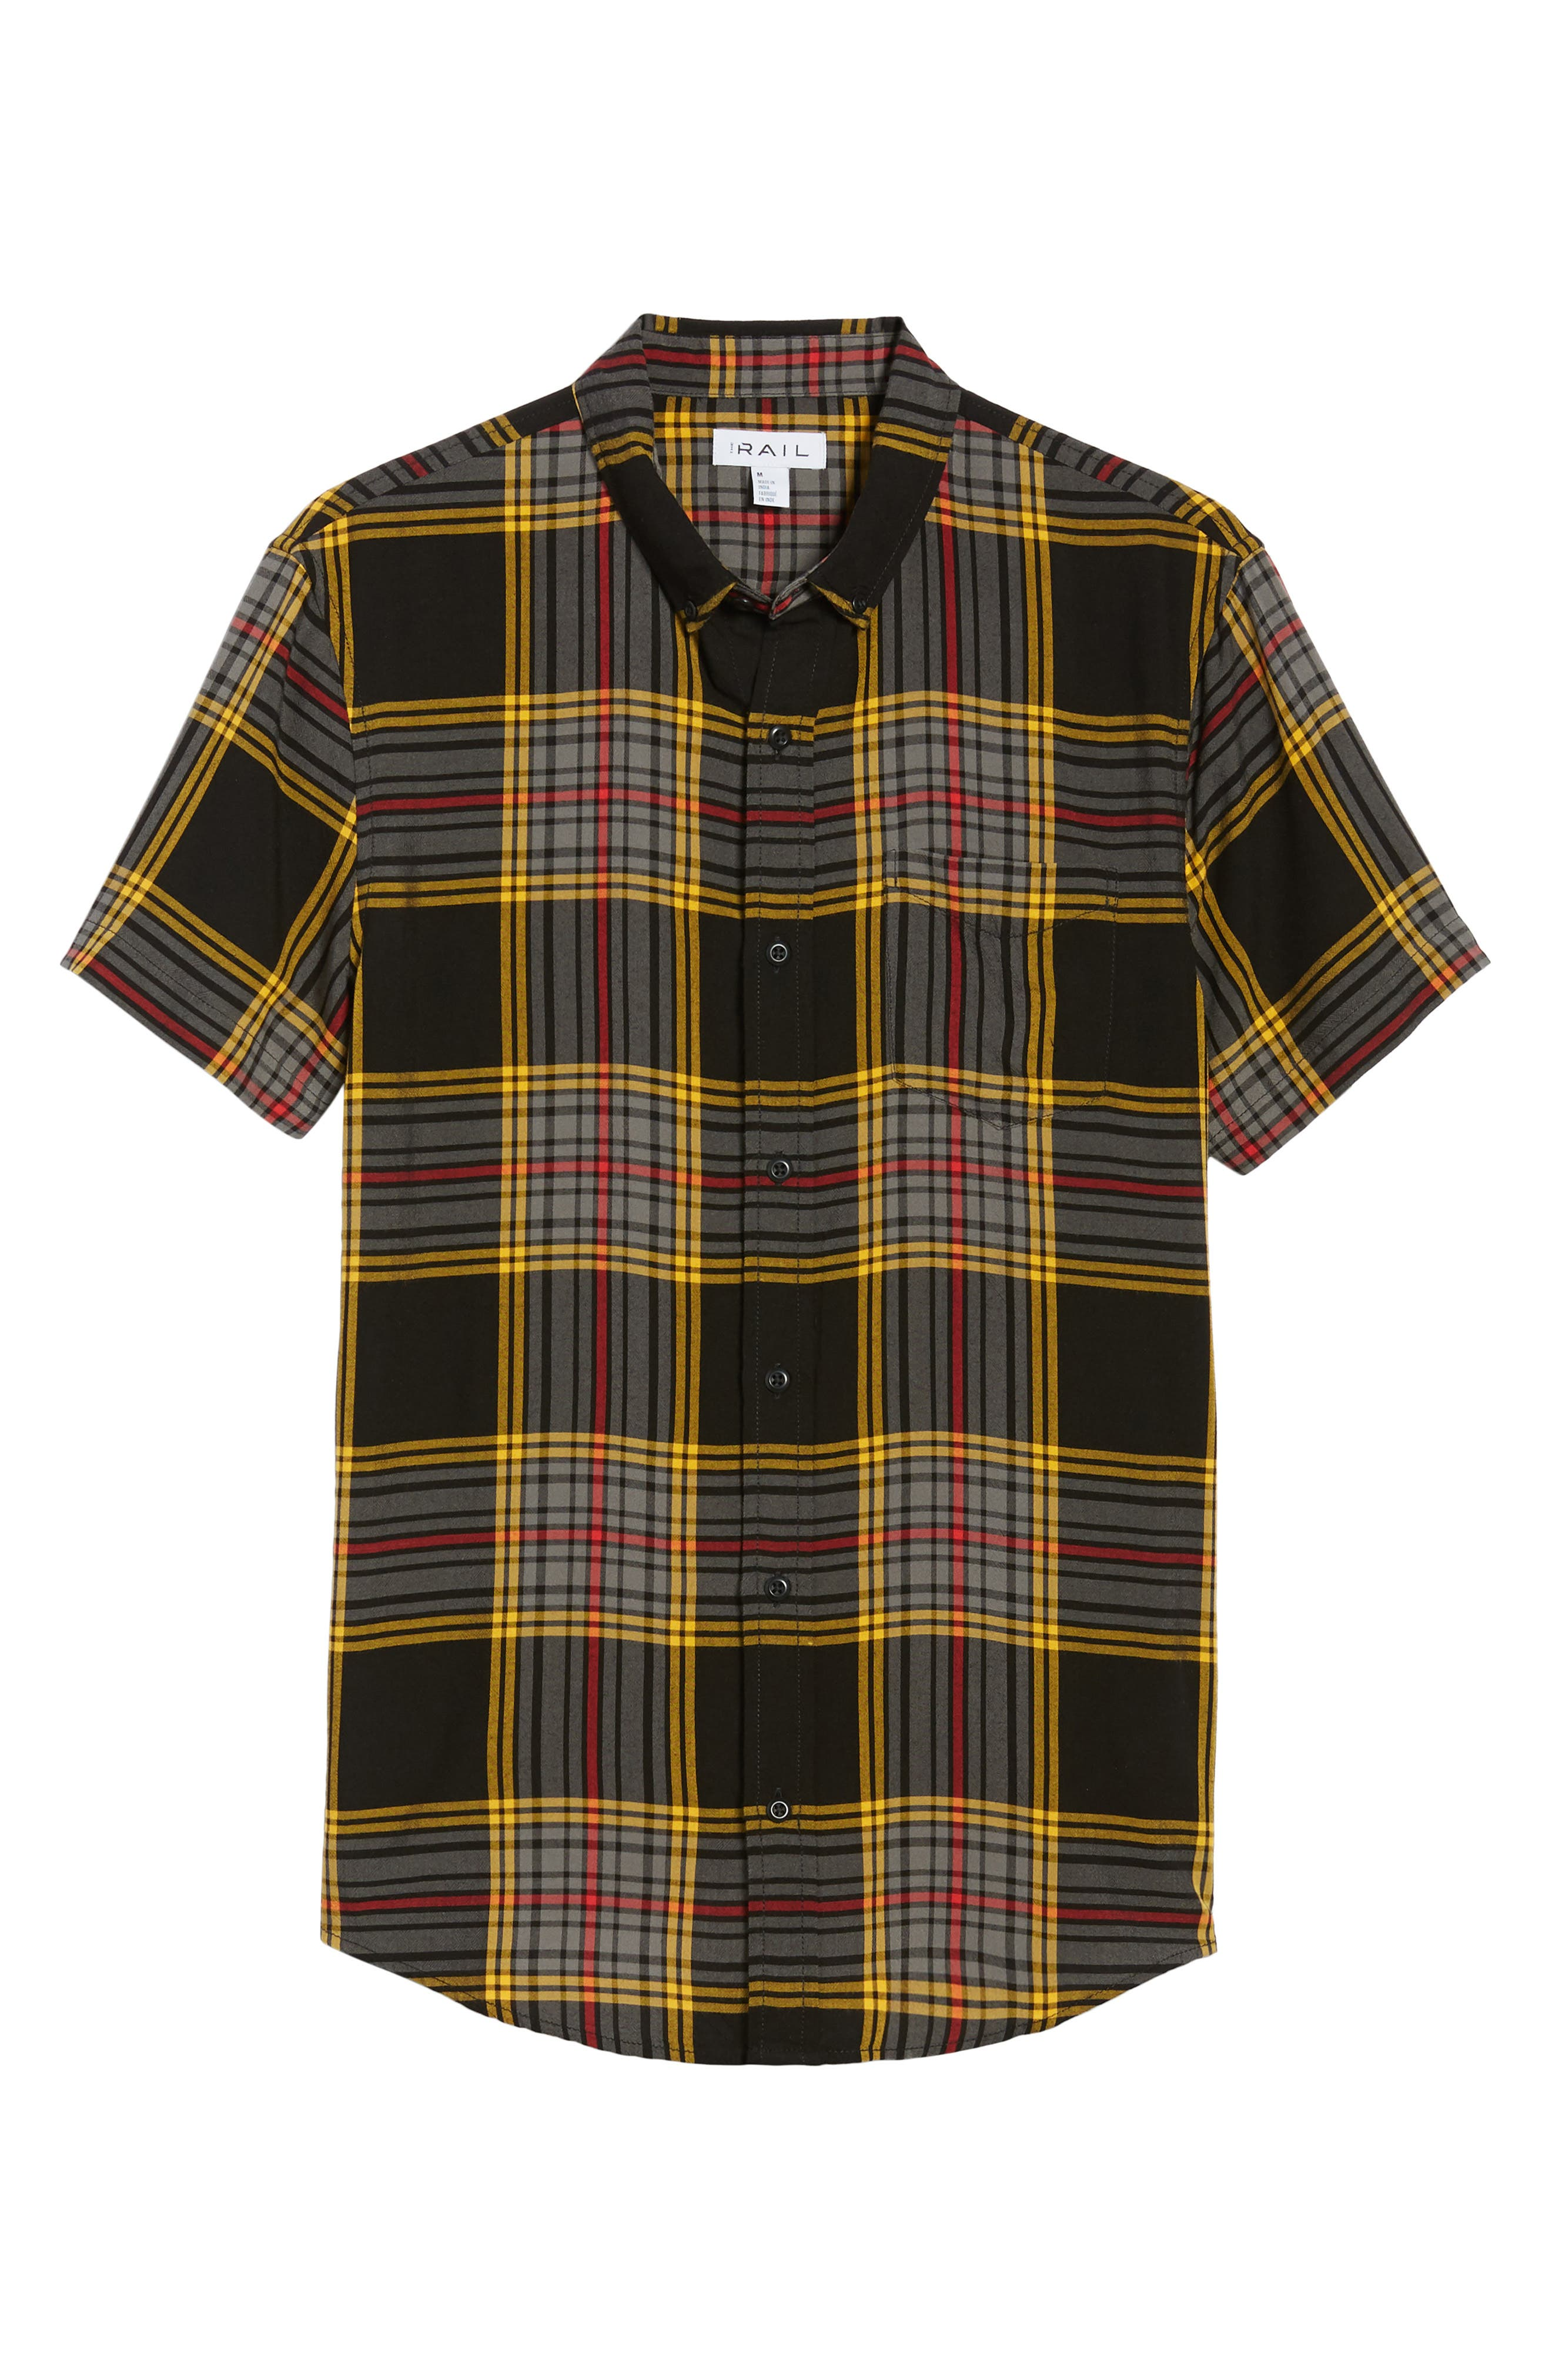 Yarn Dyed Plaid Shirt,                             Alternate thumbnail 6, color,                             Black Yellow Ethan Plaid